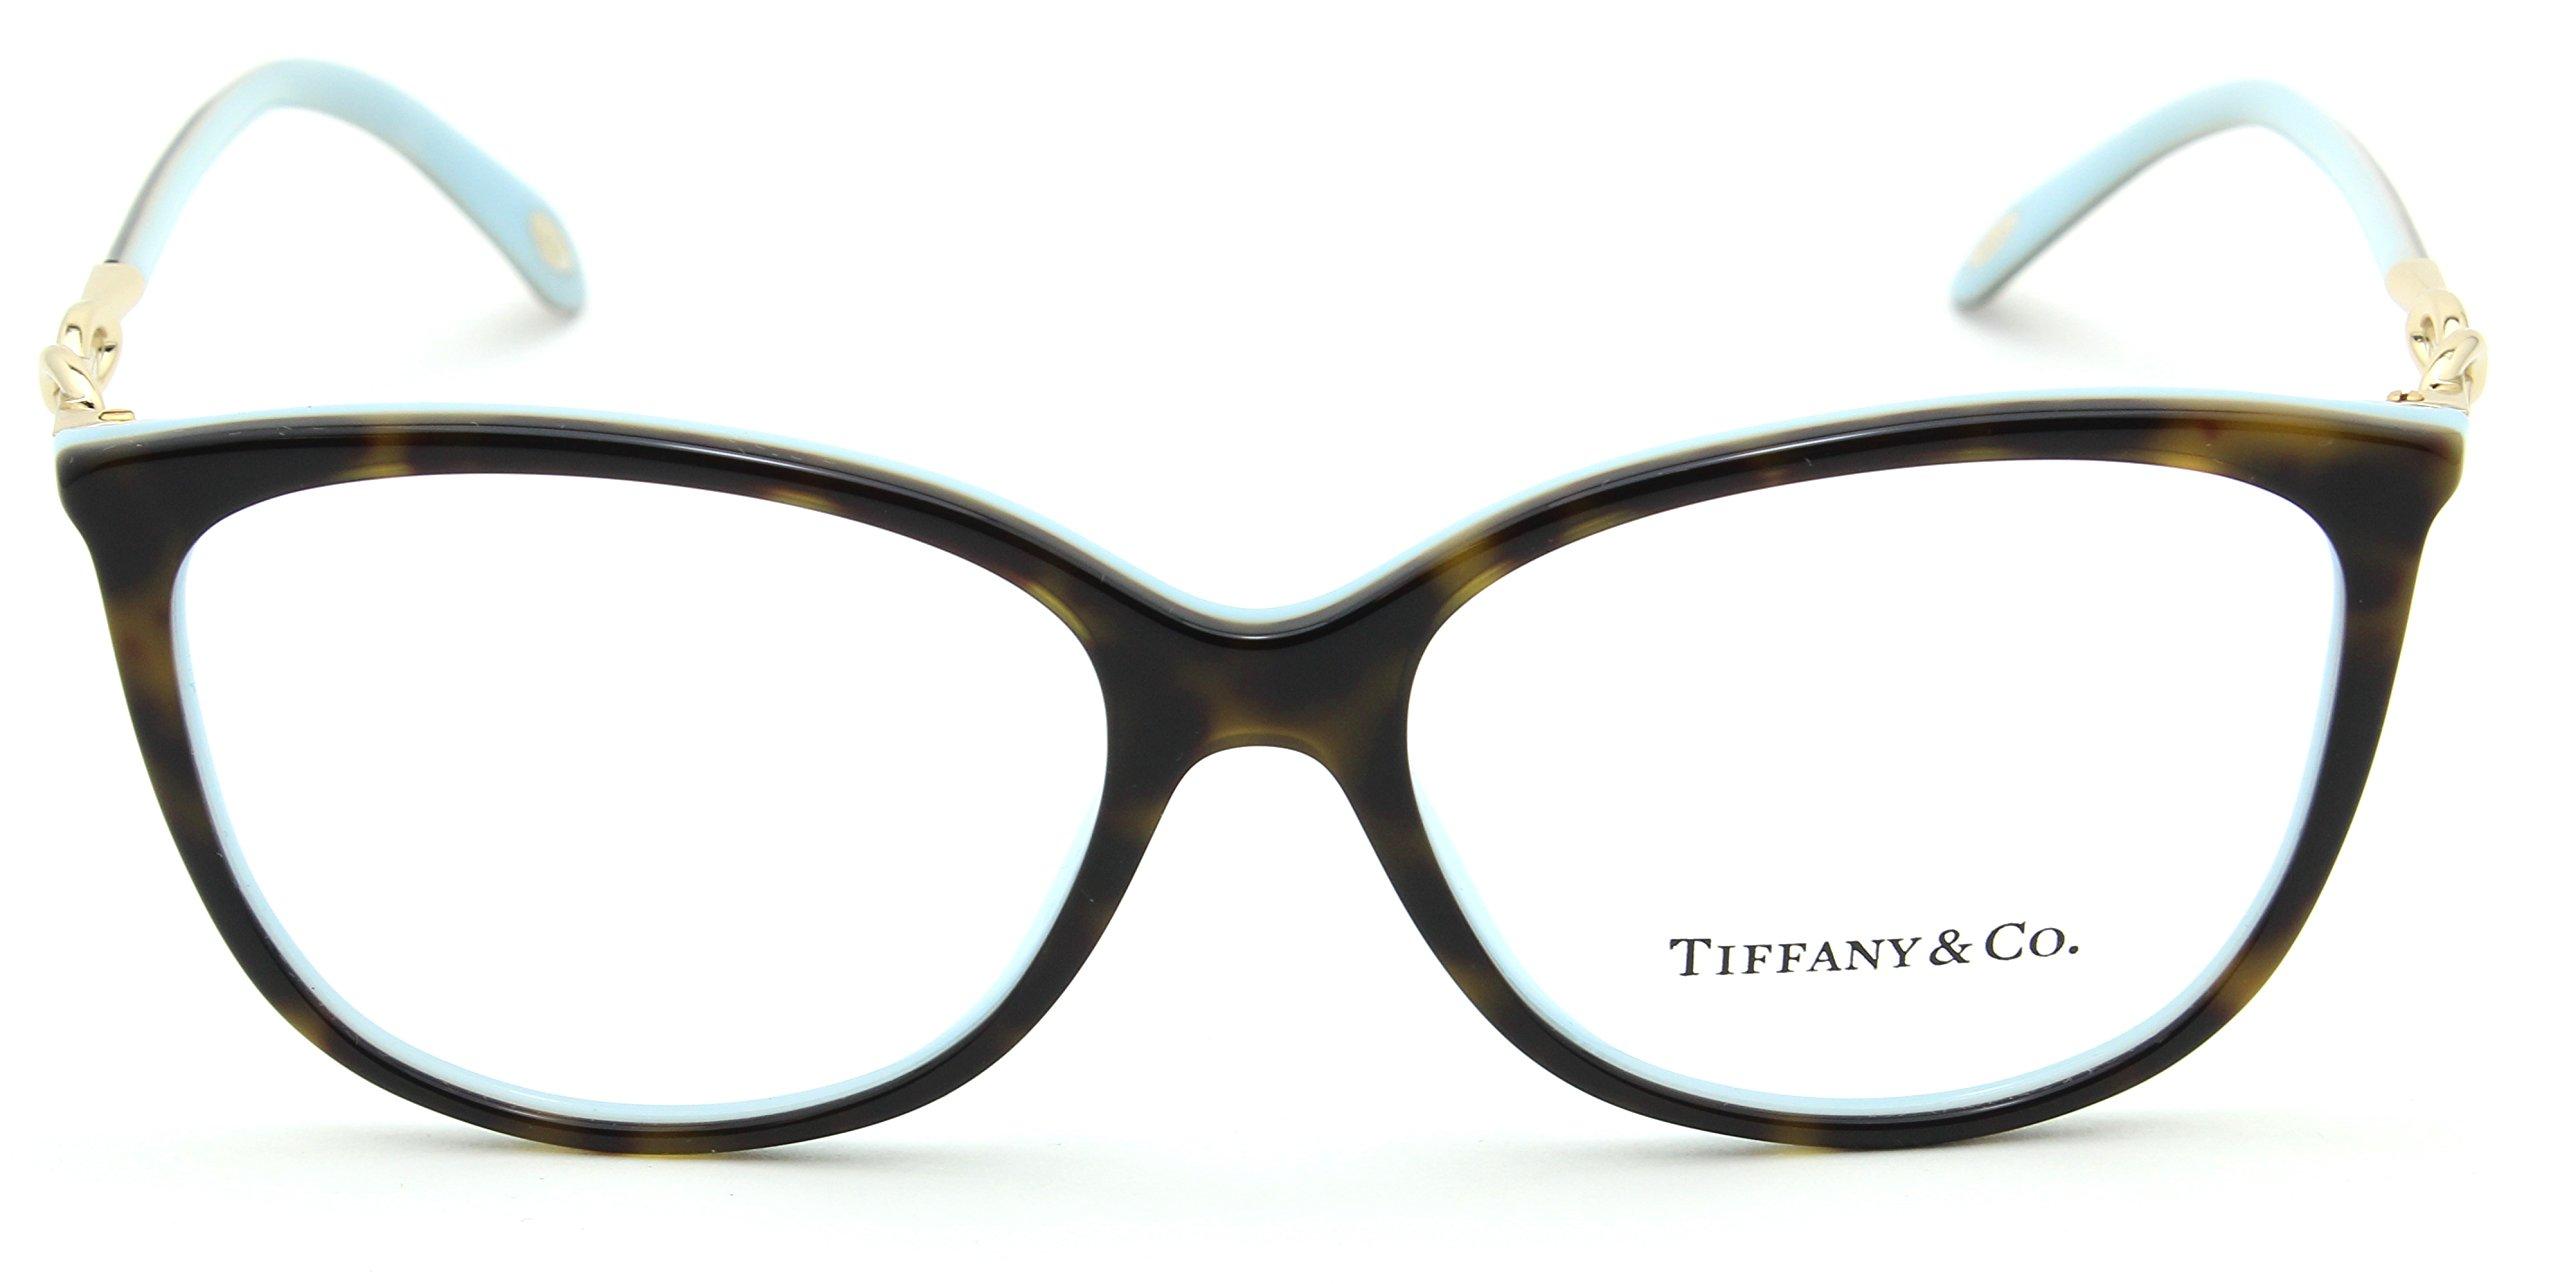 Tiffany & Co. TF 2143-B Women Oval Eyeglasses RX - able Frame (Havana Blue 8134, 53) by Tiffany & Co. (Image #2)